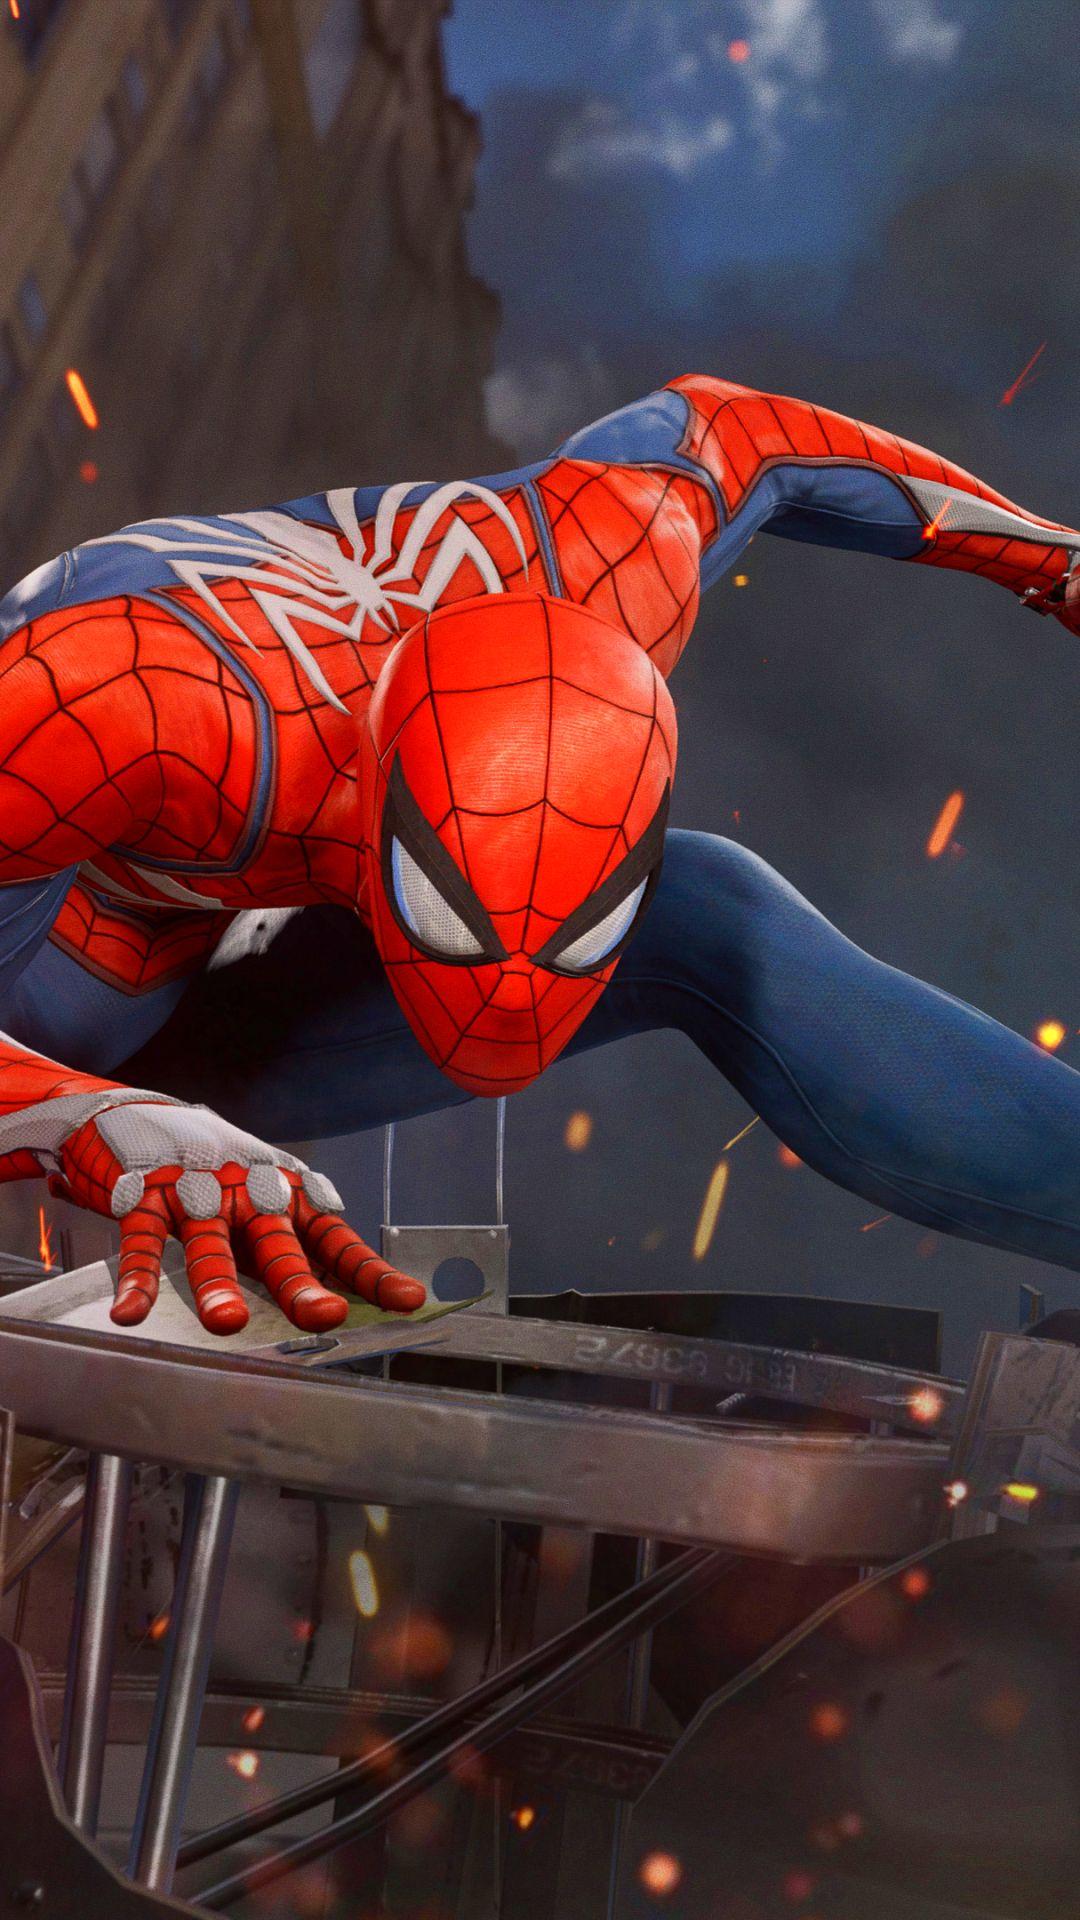 pinbryan handlos on comics | pinterest | spiderman, spiderman